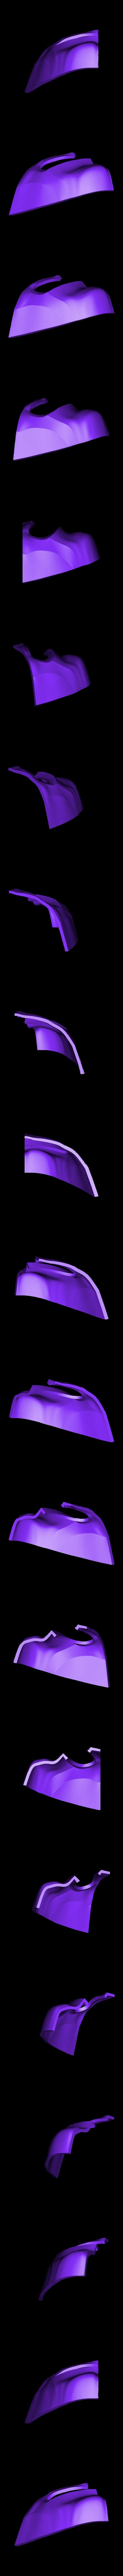 Part_5.stl Download free STL file Samurai Half Mask (Mempo) • Model to 3D print, VillainousPropShop